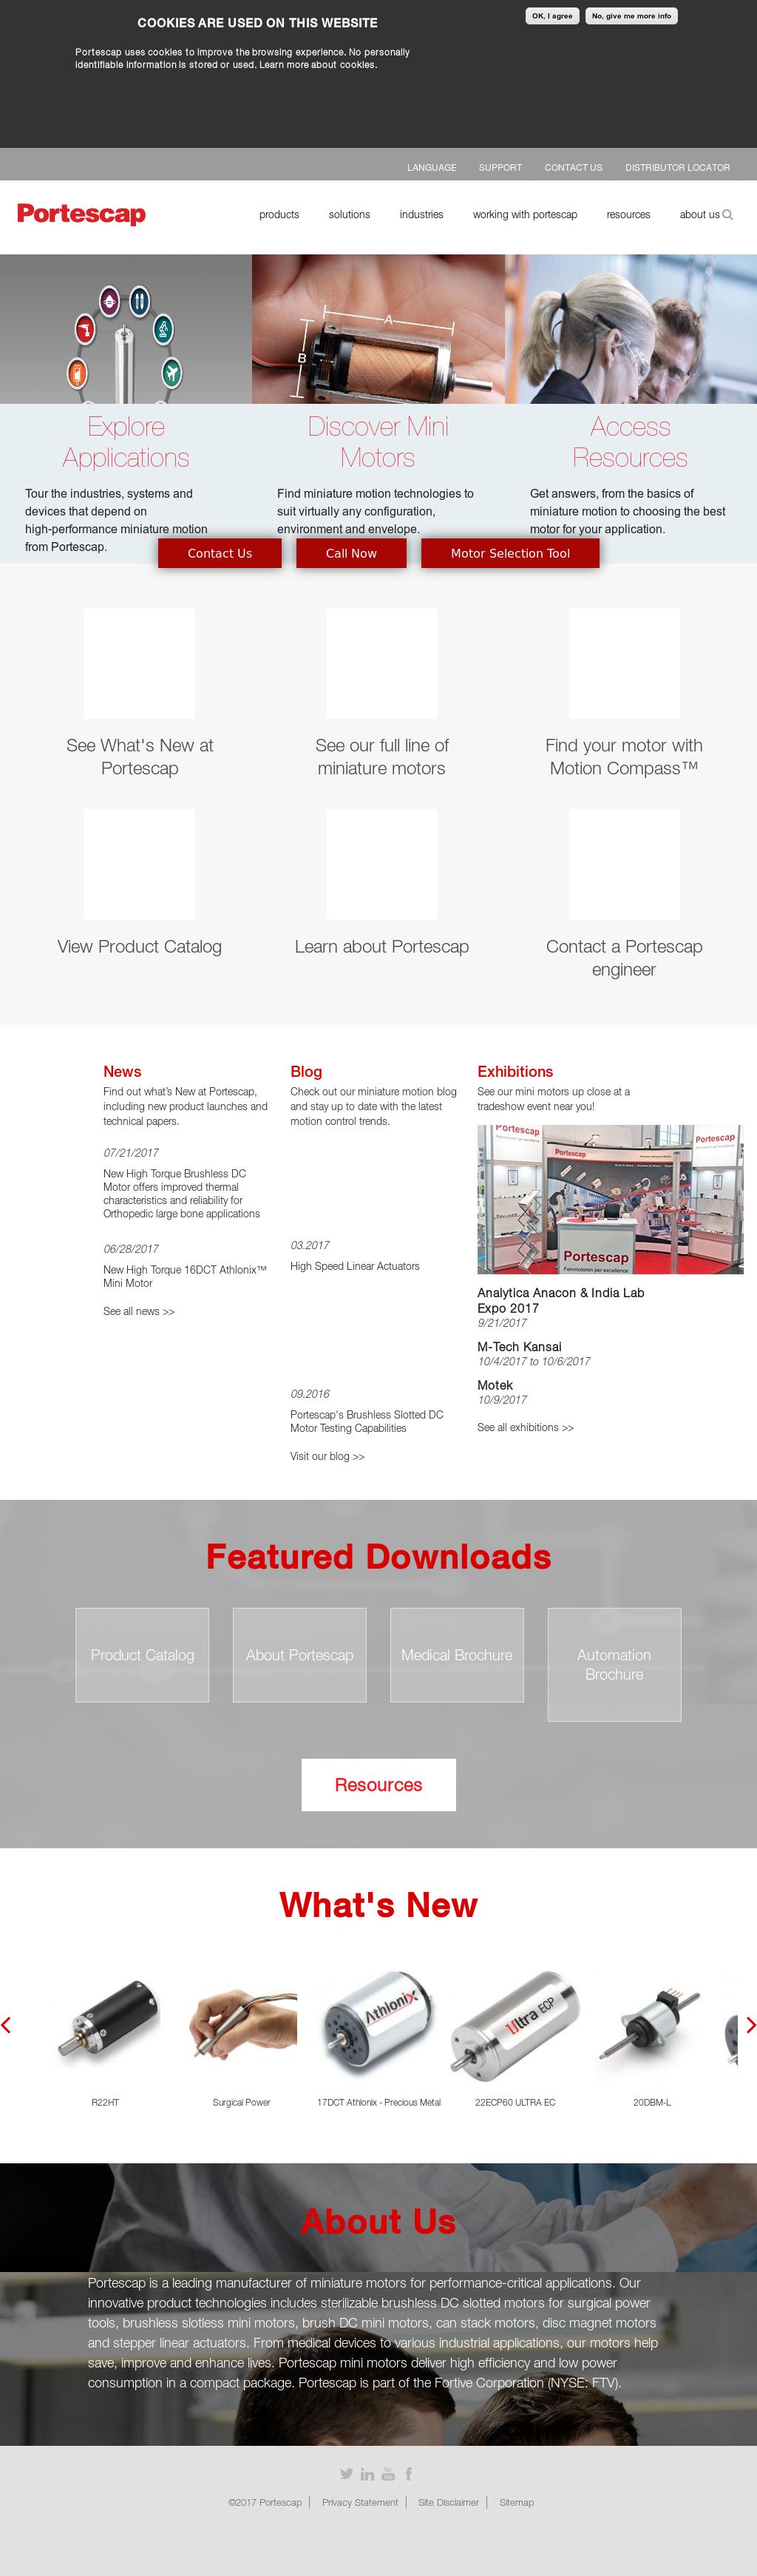 Portescap Competitors, Revenue and Employees - Owler Company Profile